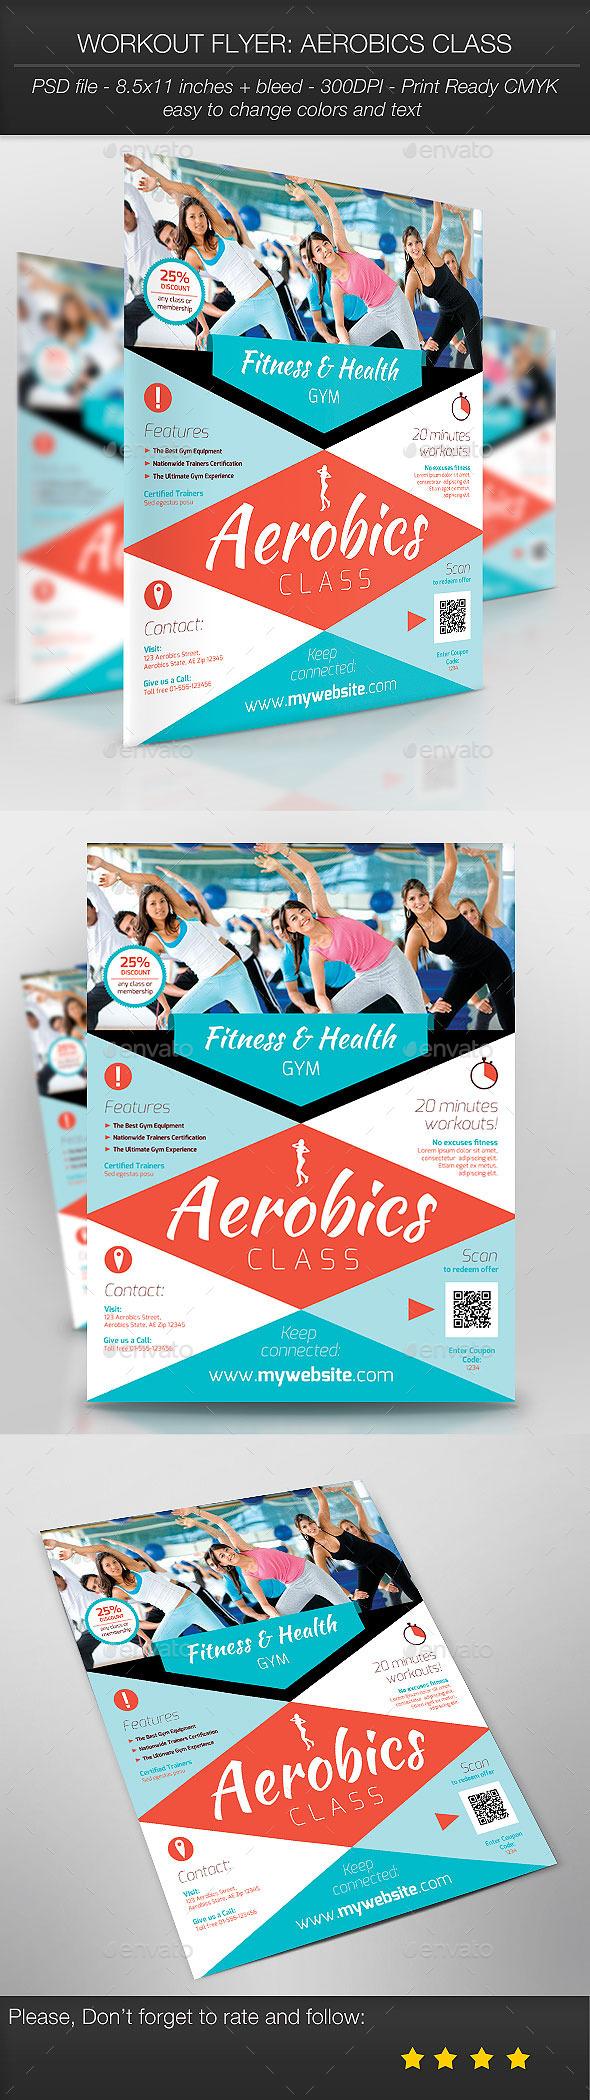 GraphicRiver Workout Flyer Aerobics Class 9409277